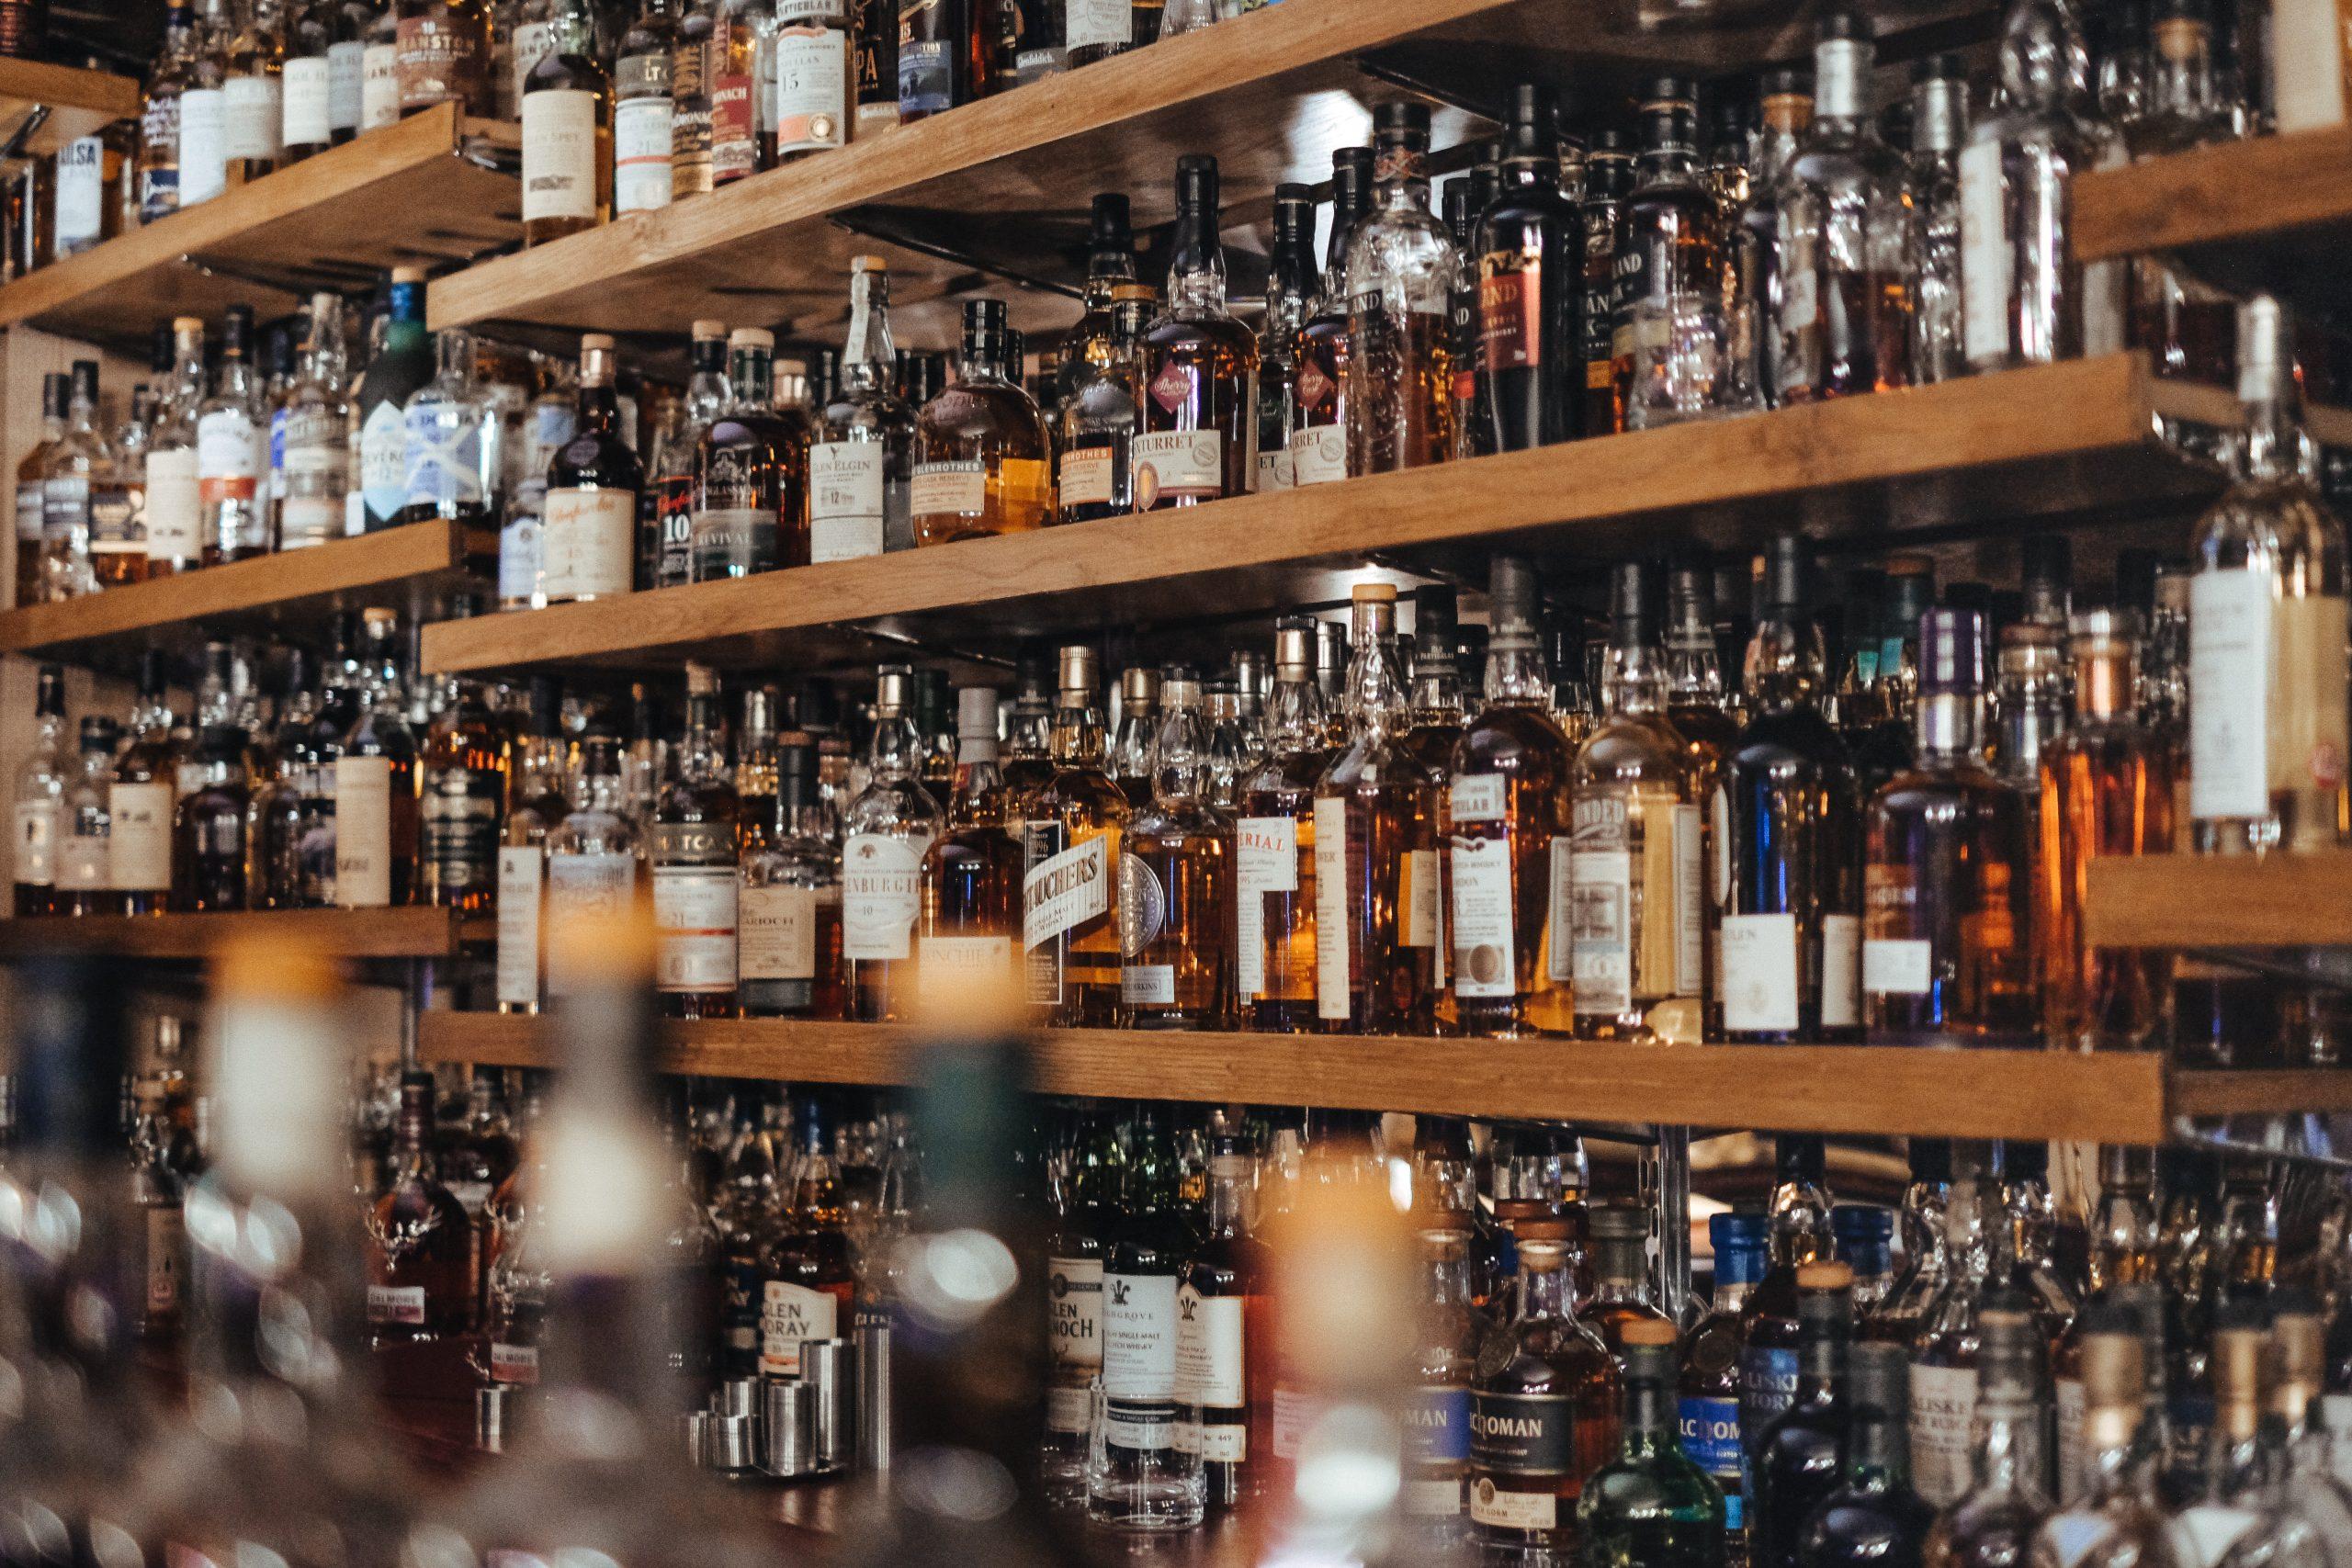 Well stocked whisky bar